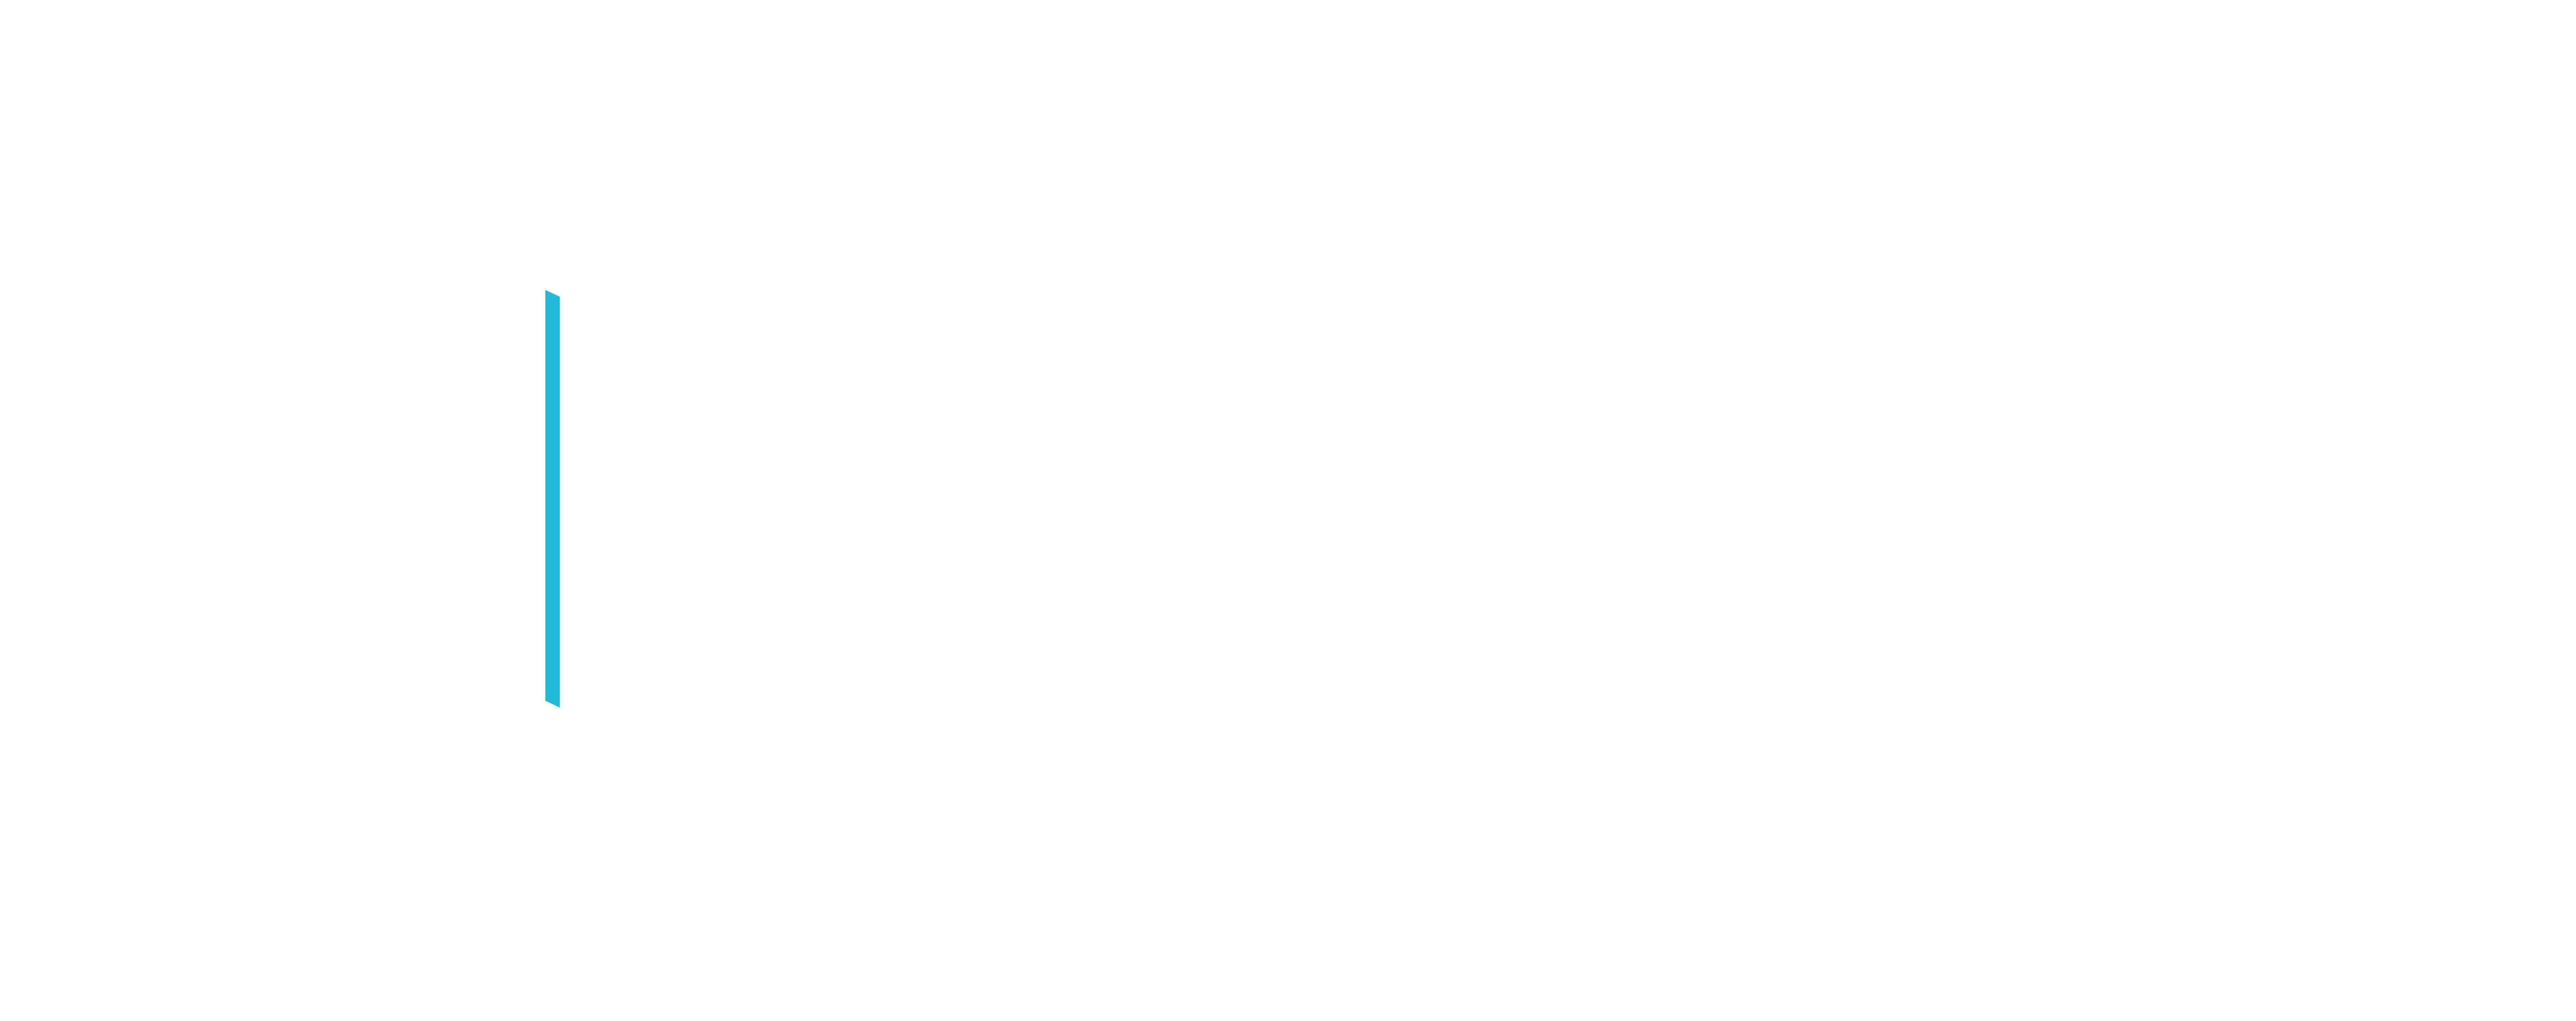 Revolving Fund Management Directorate